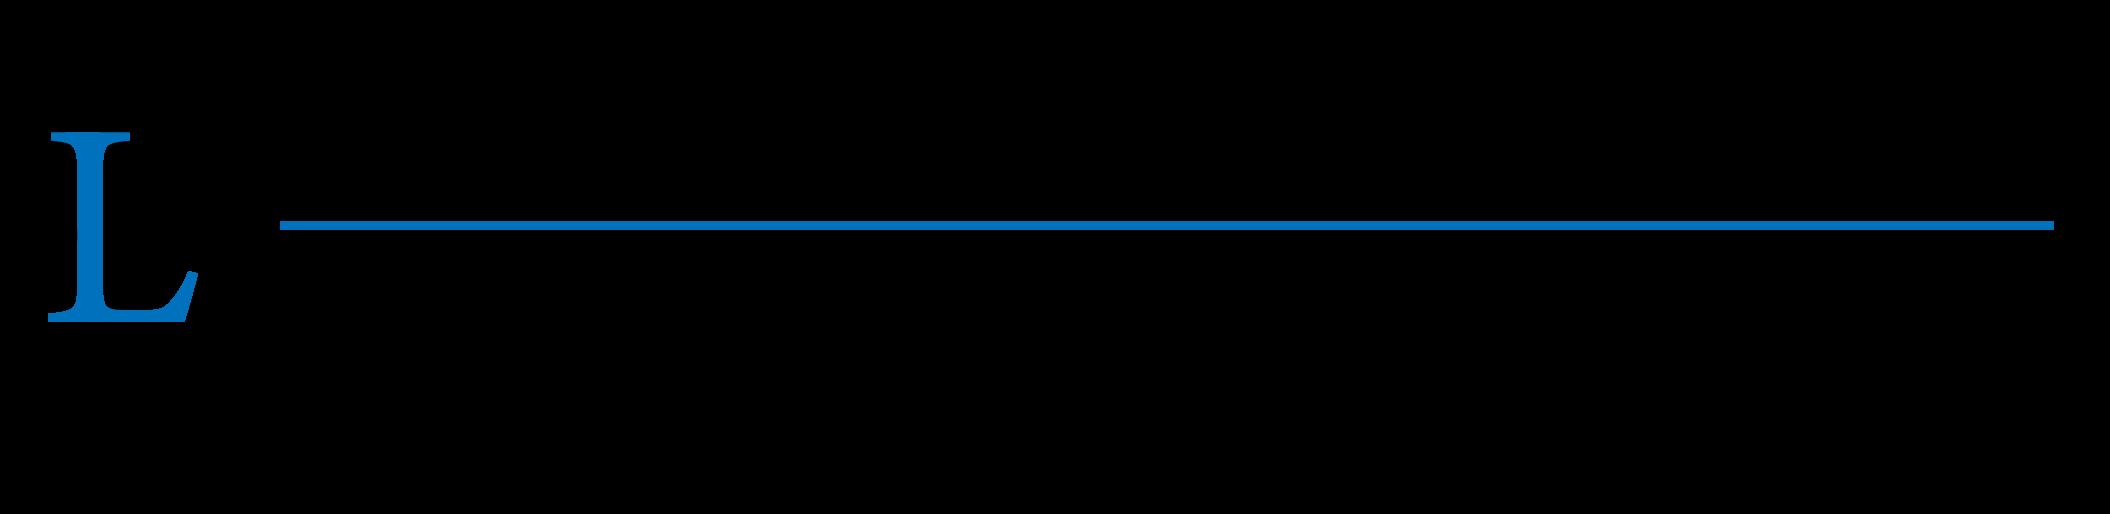 Business Leadership Council Logo